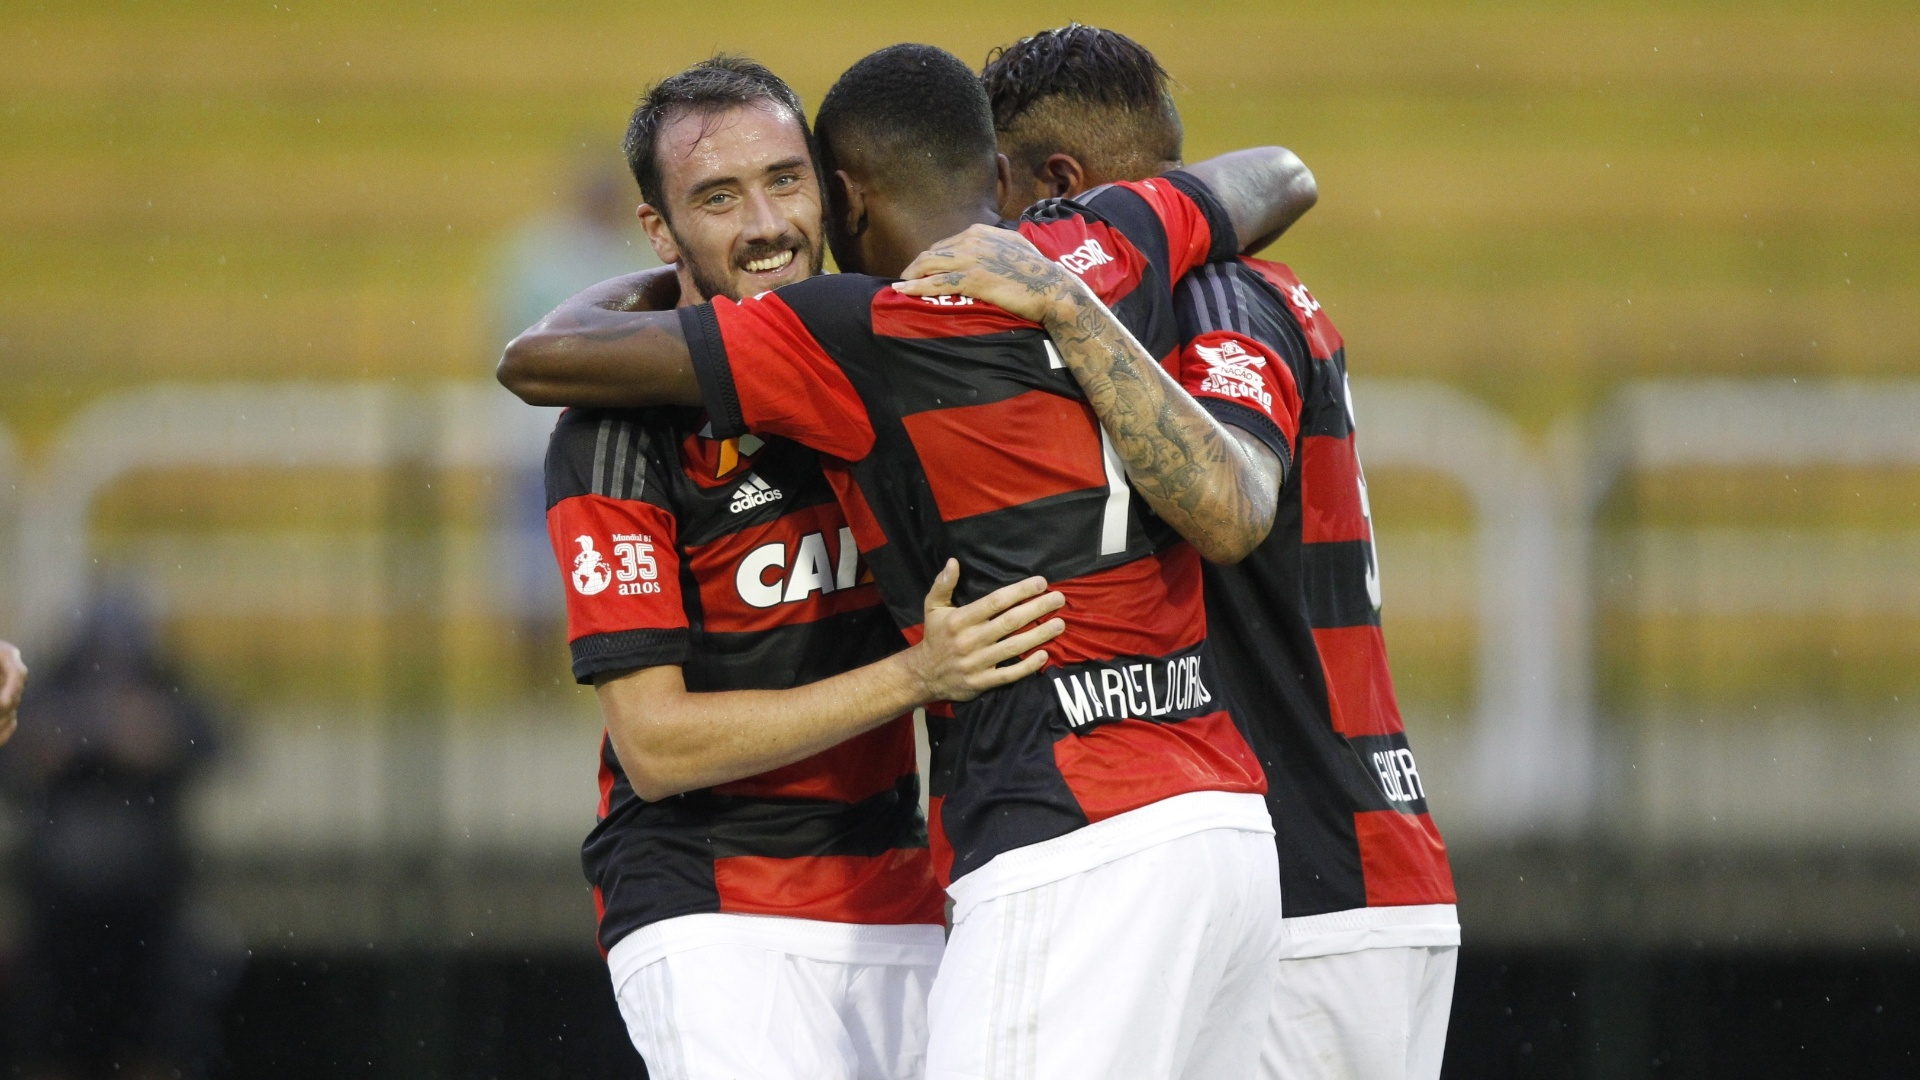 Mancuello abraça Marcelo Cirino e Mancuello durante os 5 a 0 do Flamengo sobre o Resende